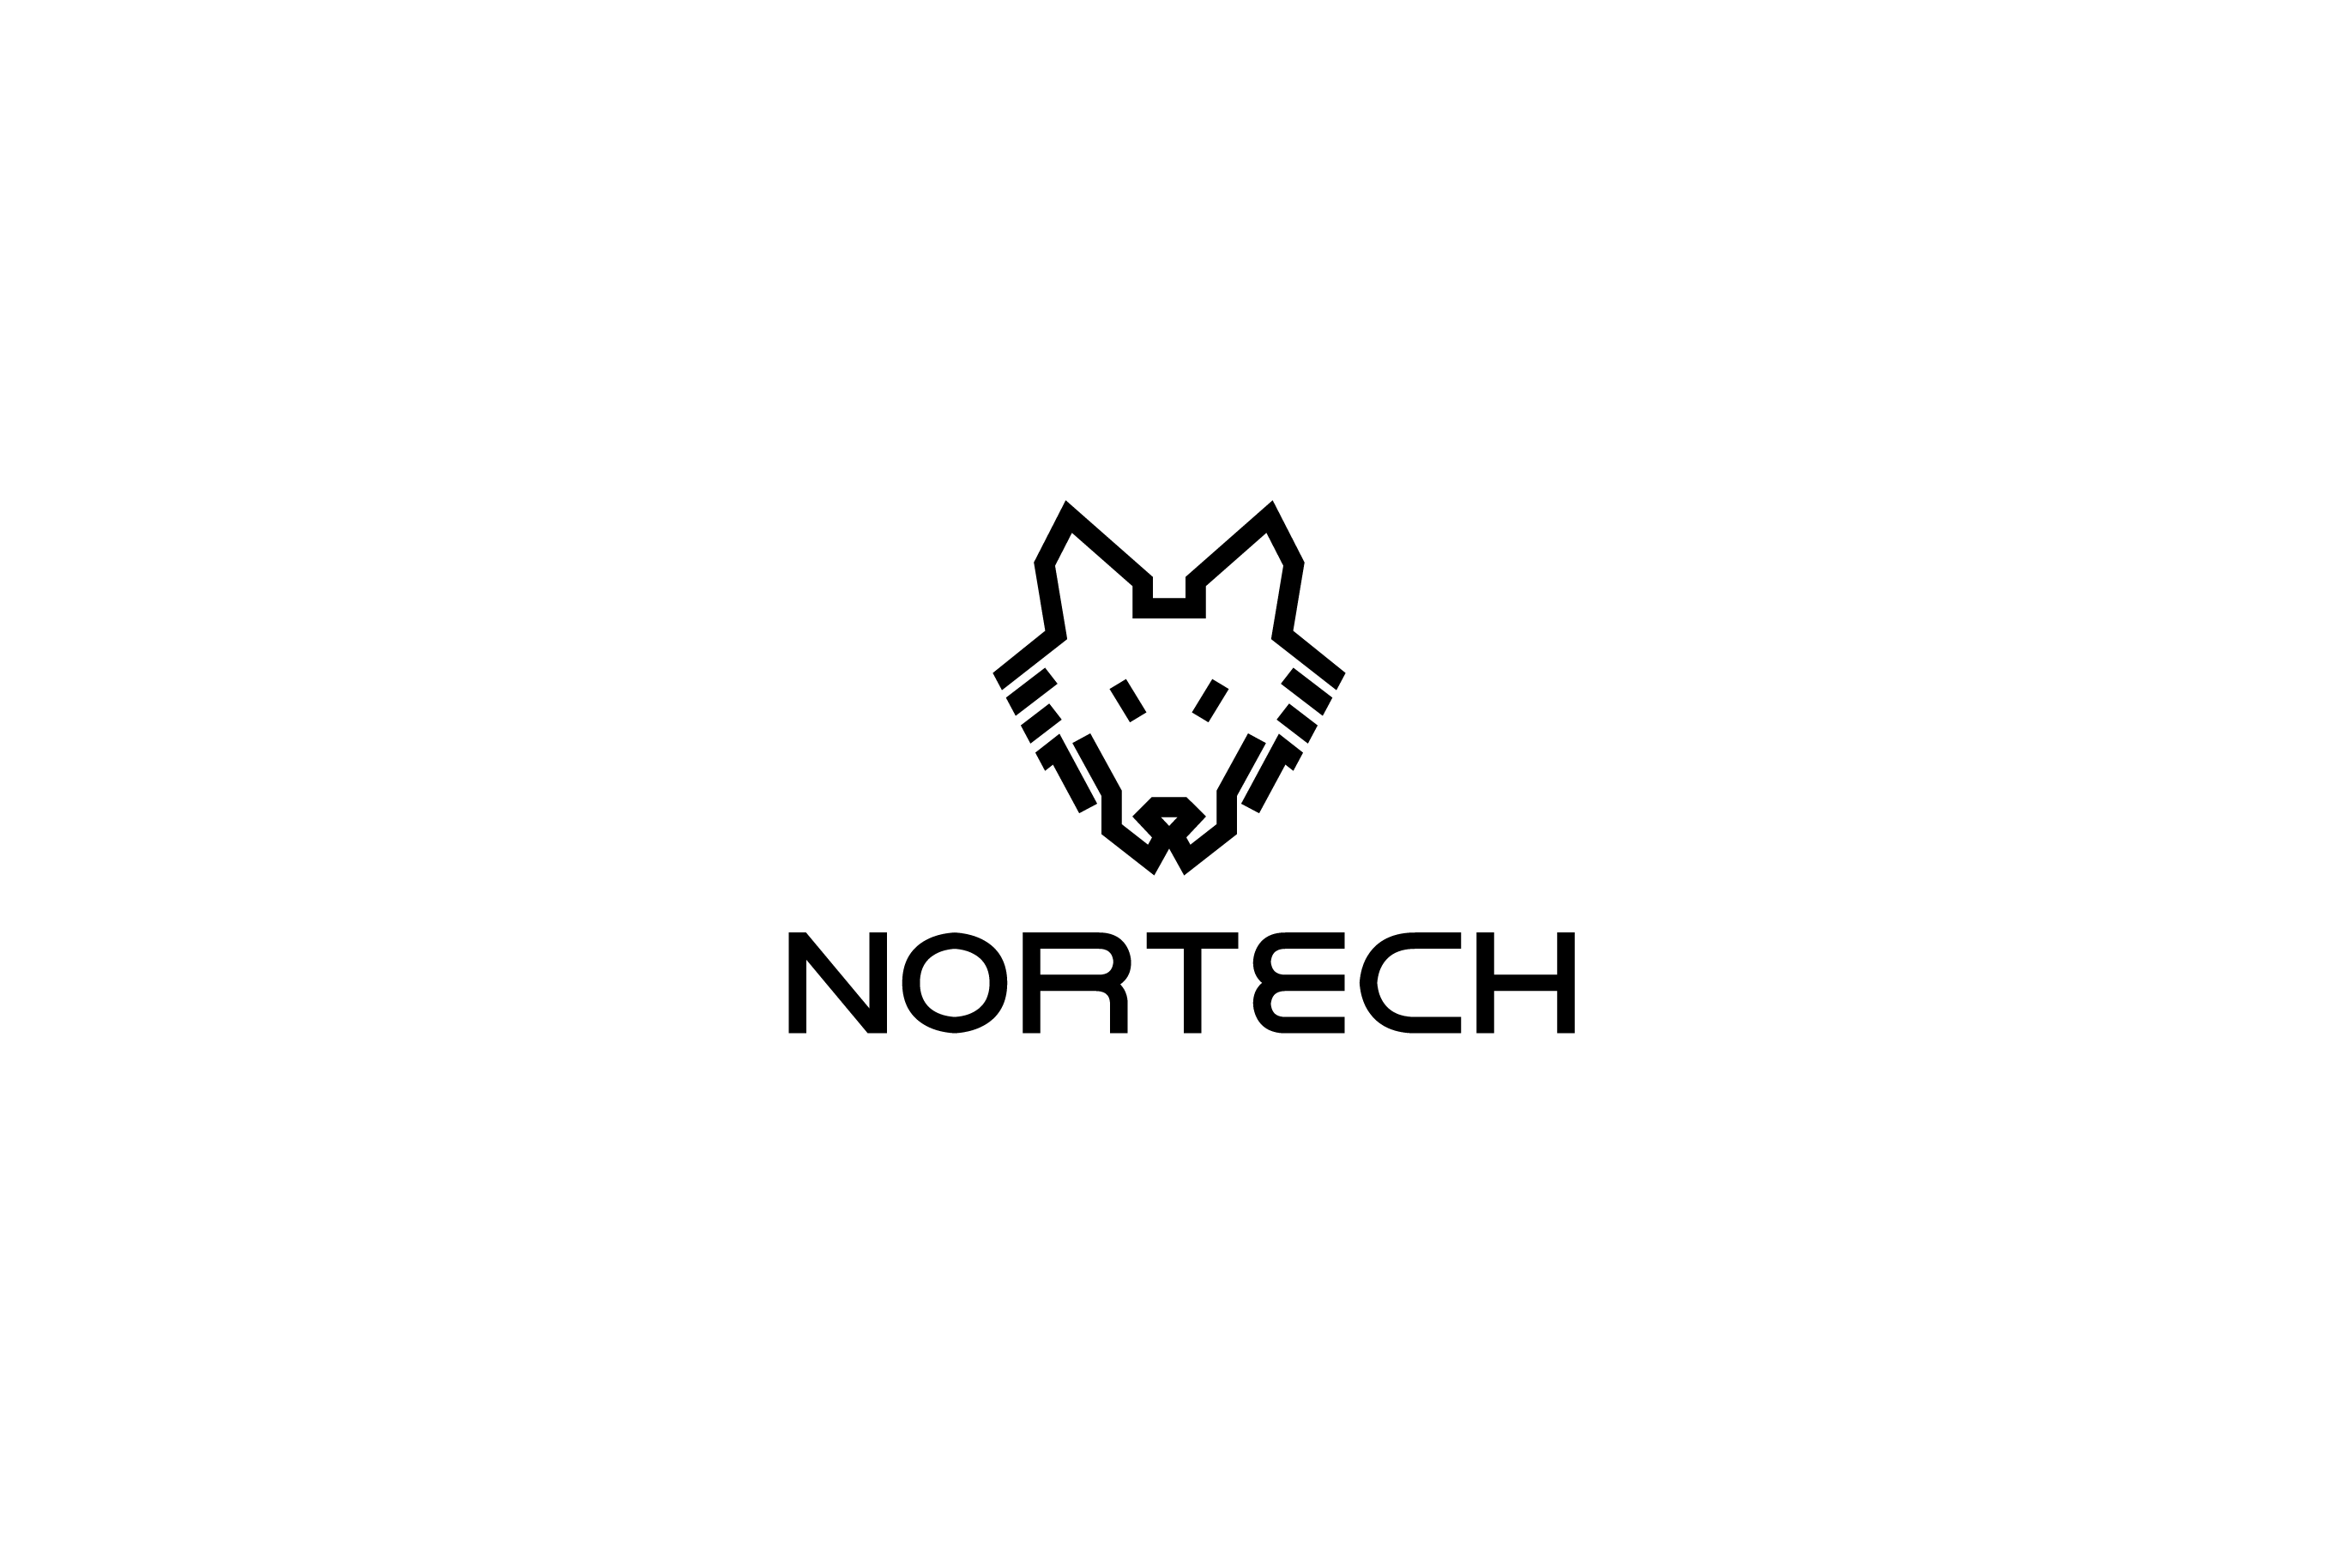 Nortech Wolf Logo SOLD Logo Cowboy